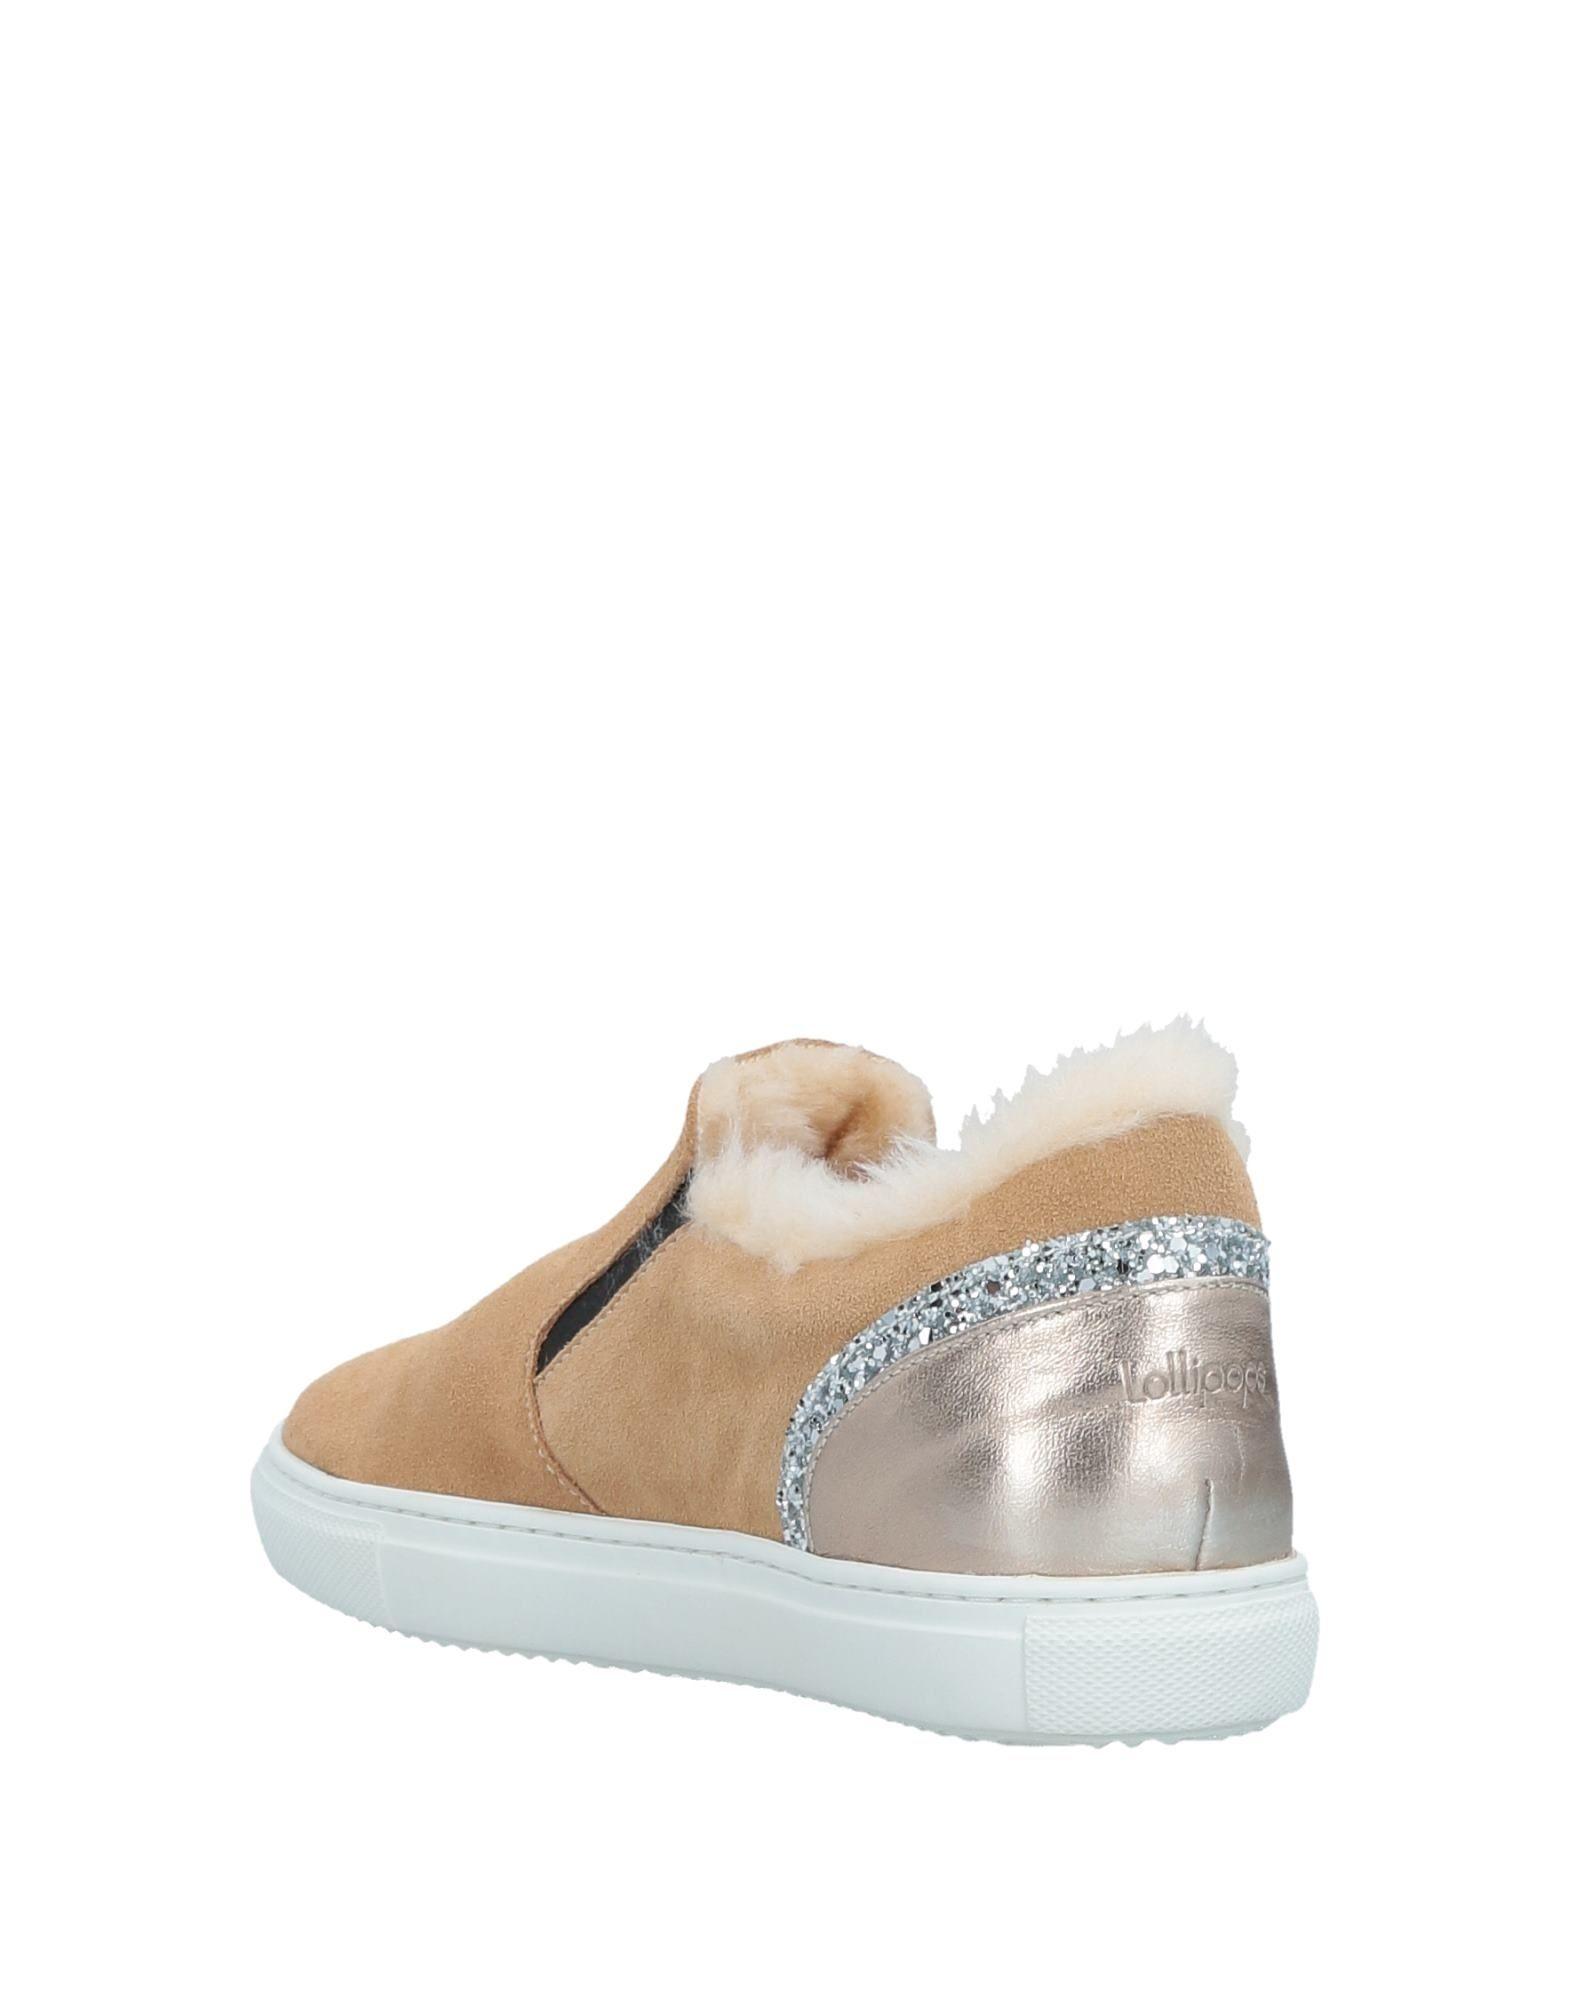 Lollipops 11520958QT Sneakers Damen  11520958QT Lollipops Gute Qualität beliebte Schuhe 3f192a